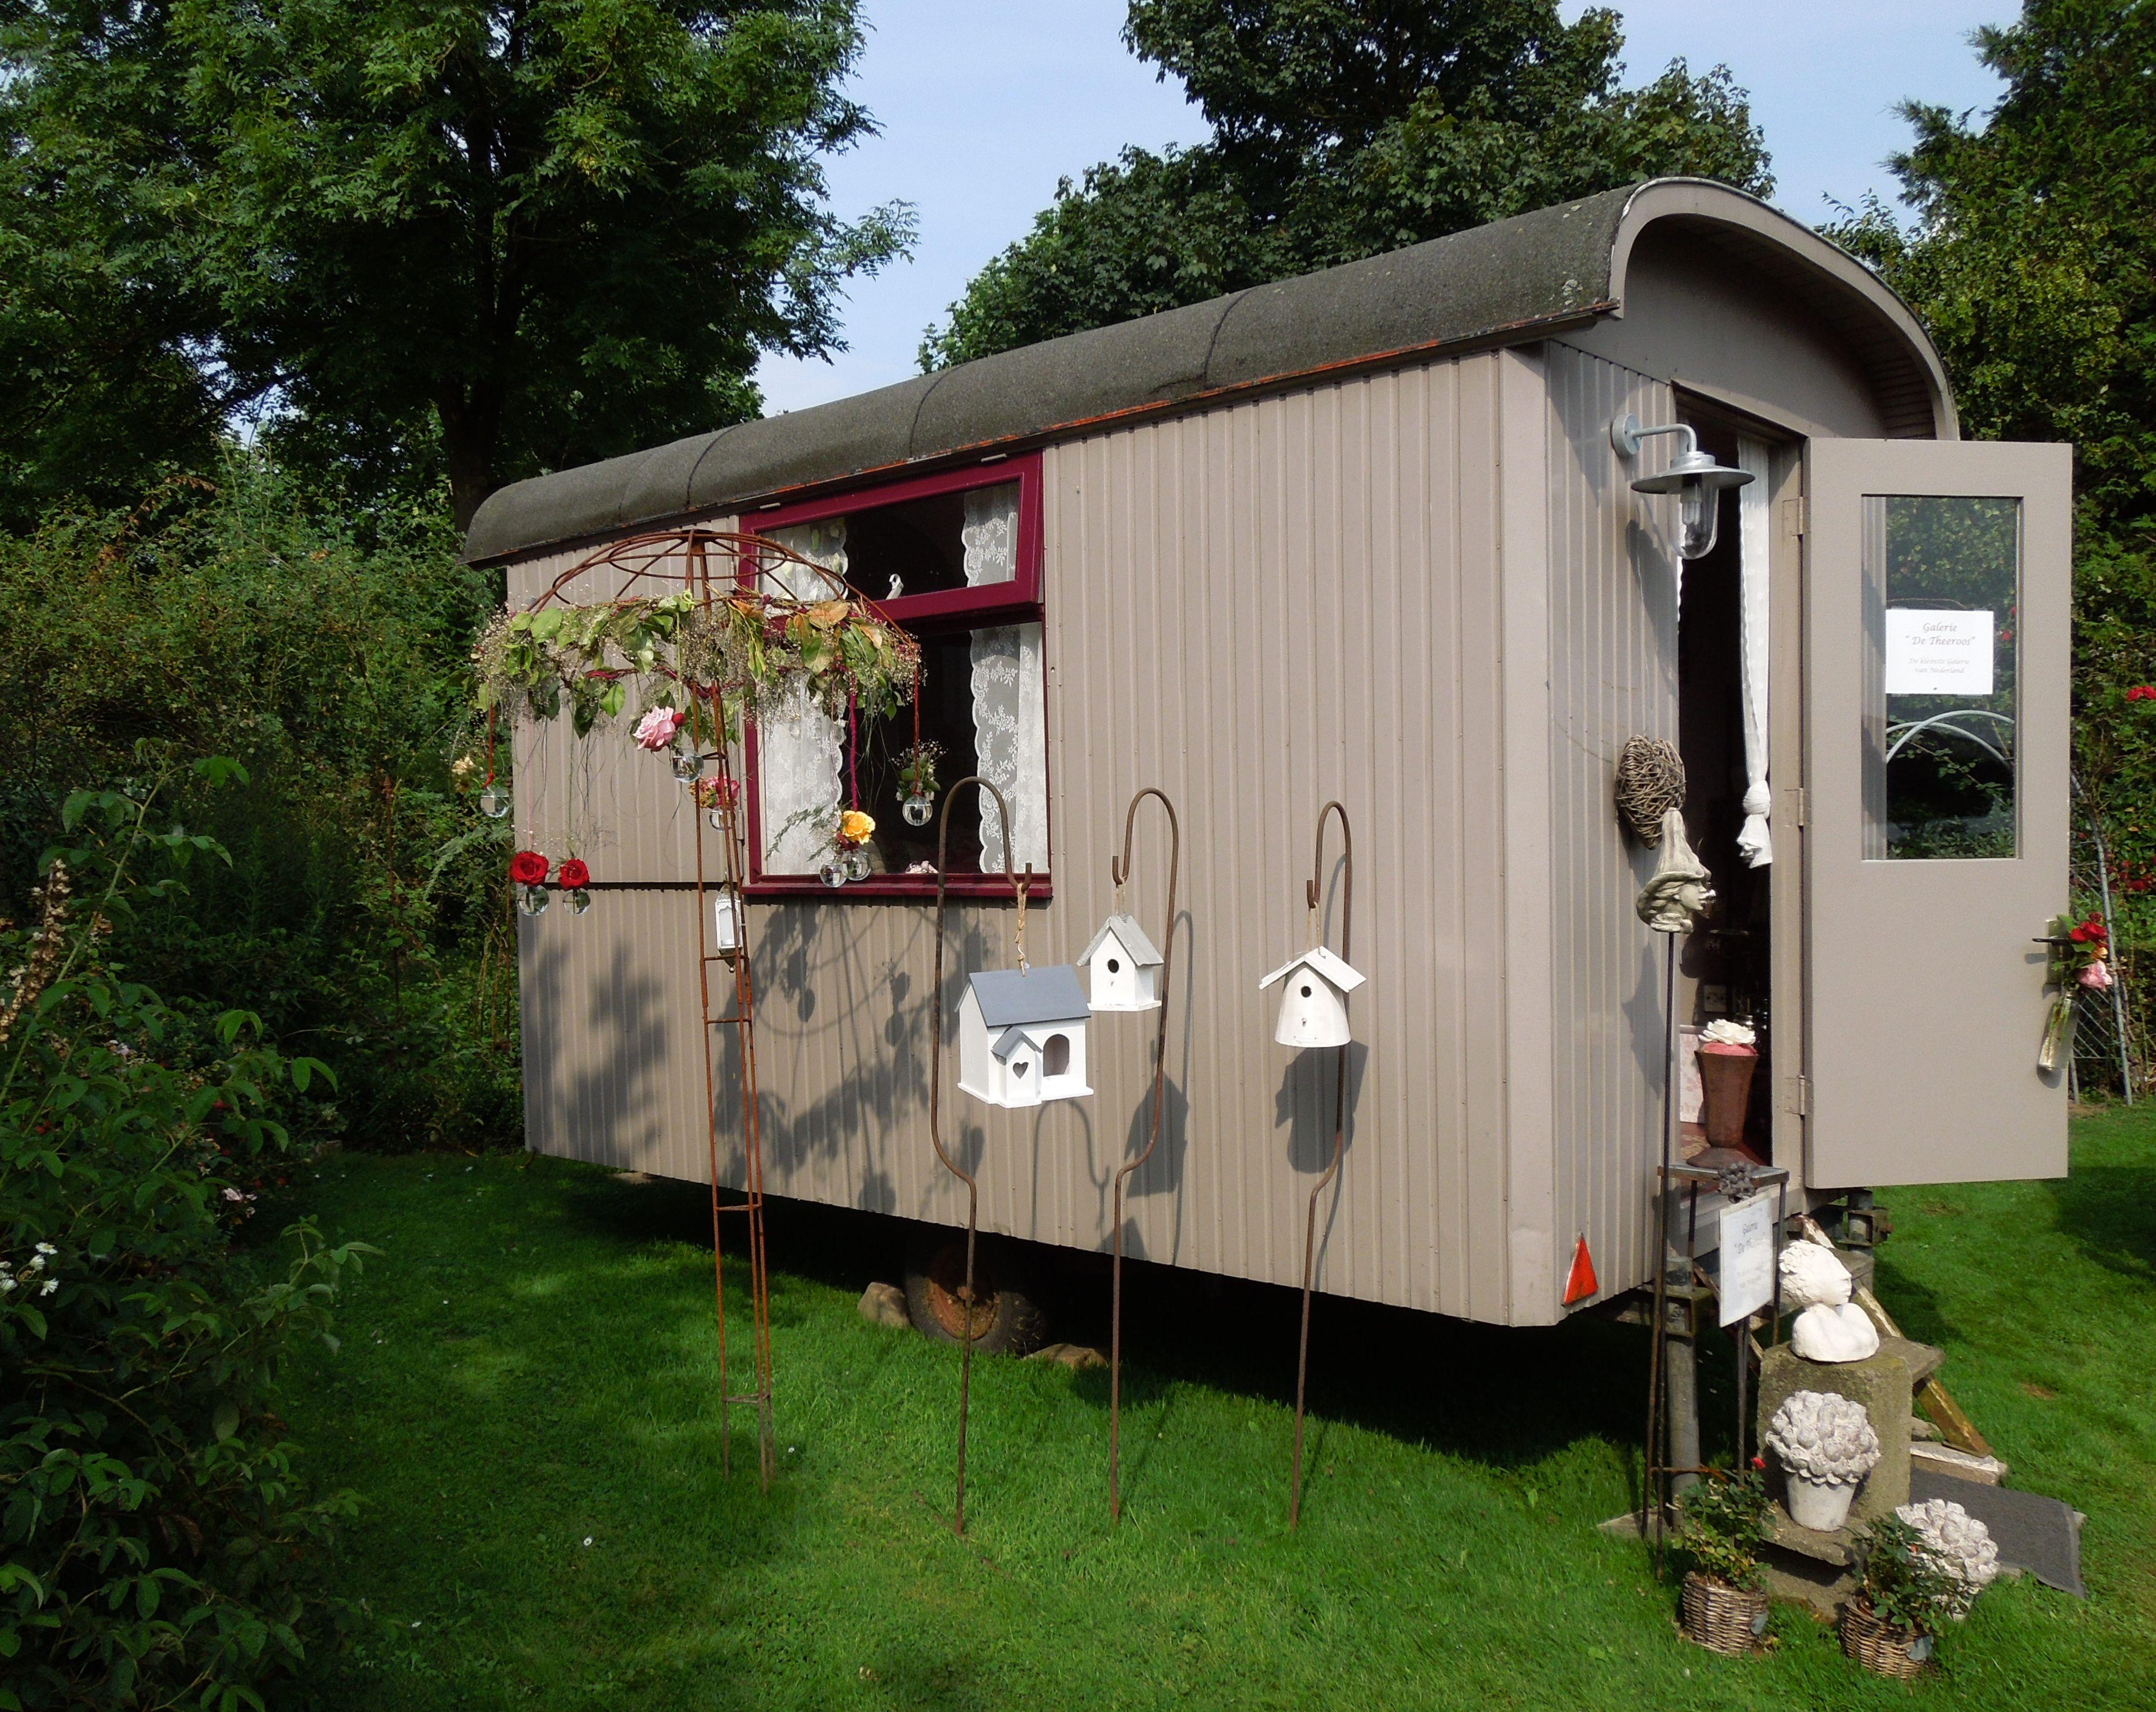 pipowagen gezien aan camping in rozendorp lottum in nederland gypsy wagon woonwagen. Black Bedroom Furniture Sets. Home Design Ideas